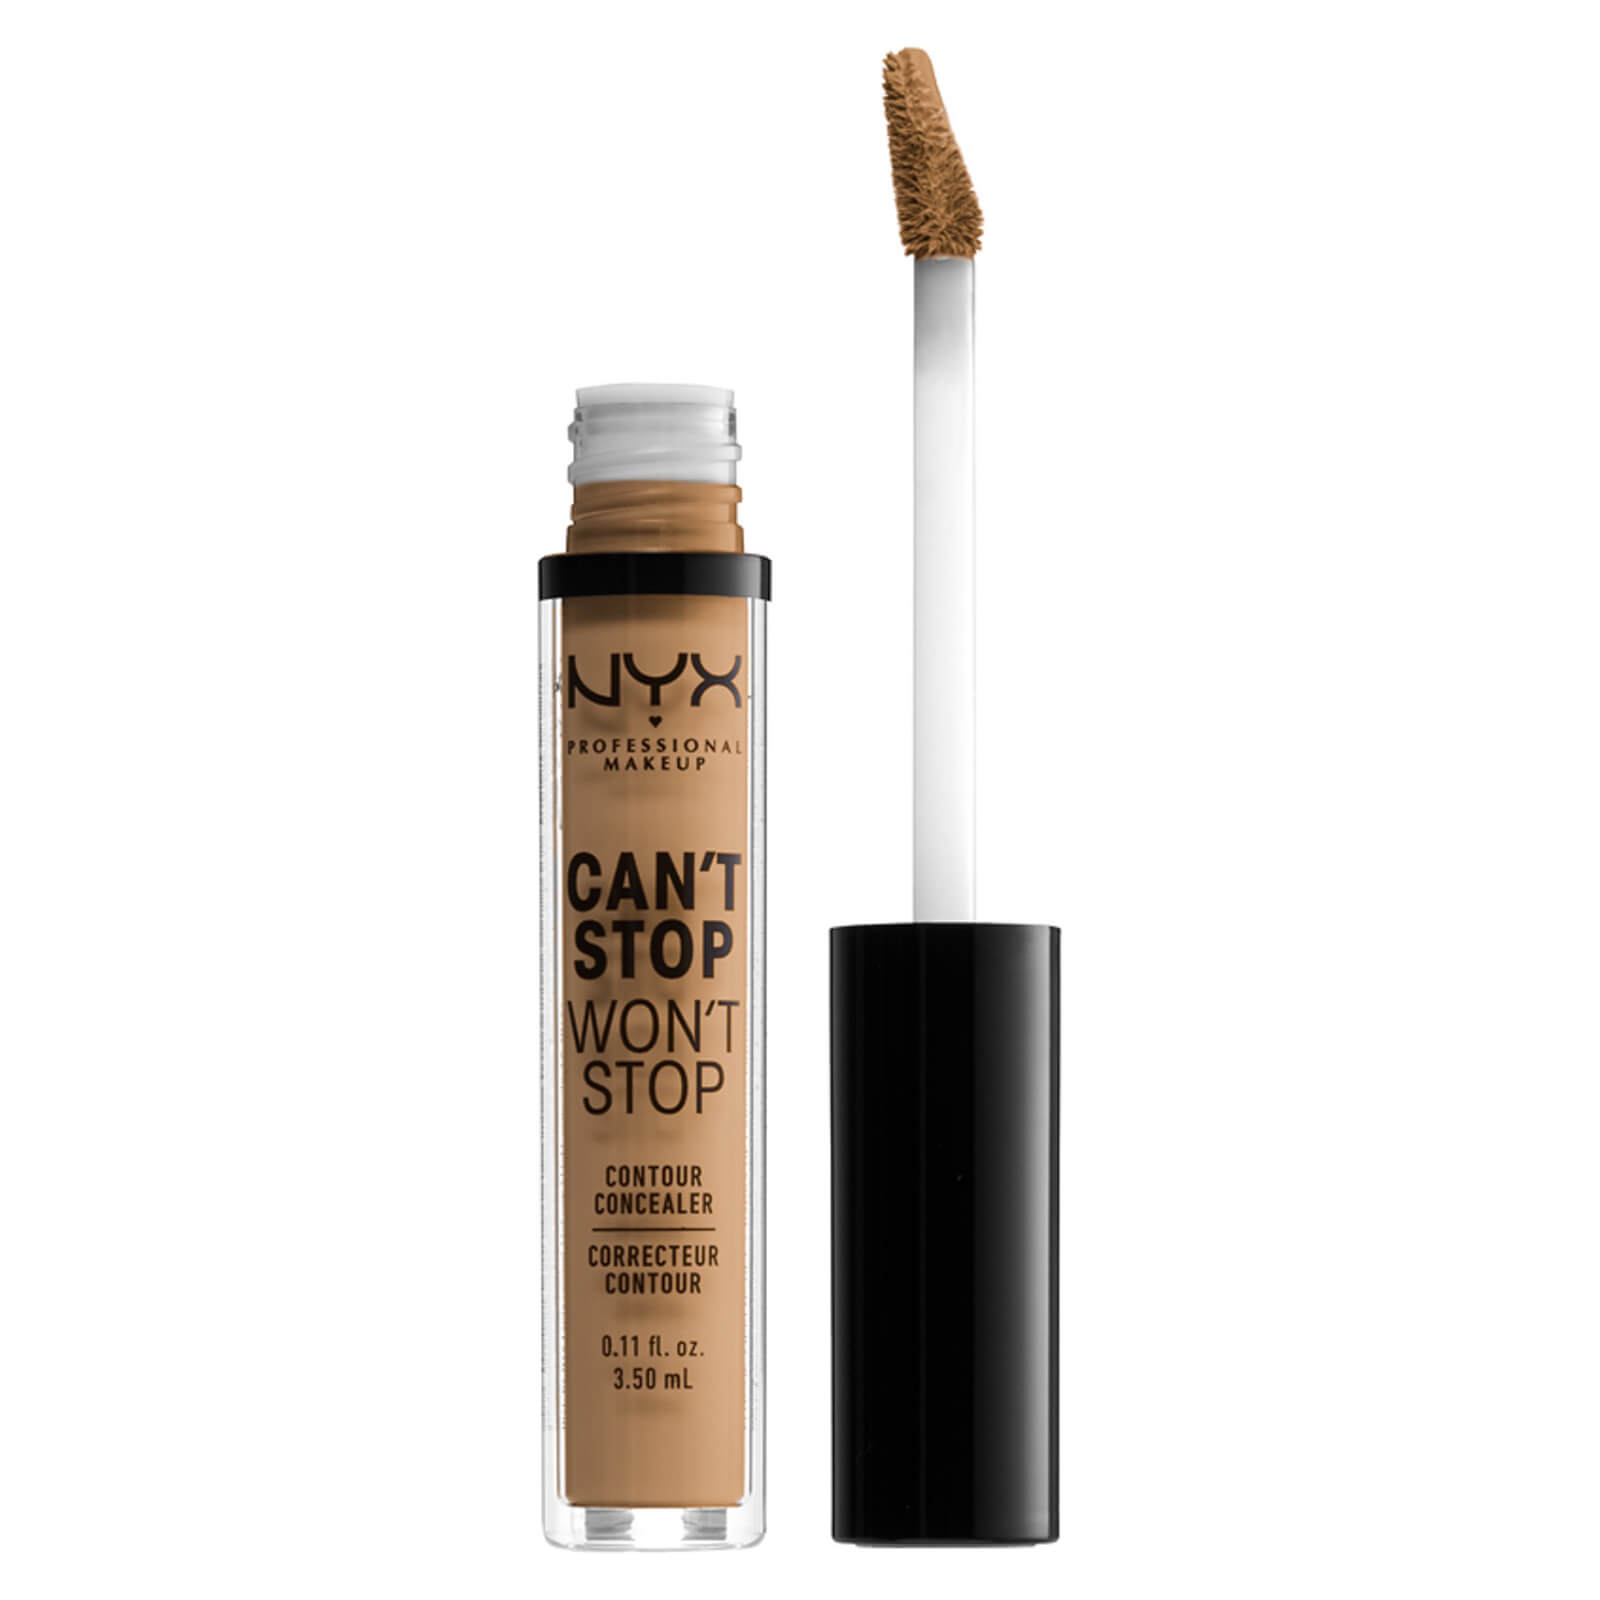 NYX Professional Makeup Can't Stop Won't Stop Contour Concealer (Various Shades) - Golden